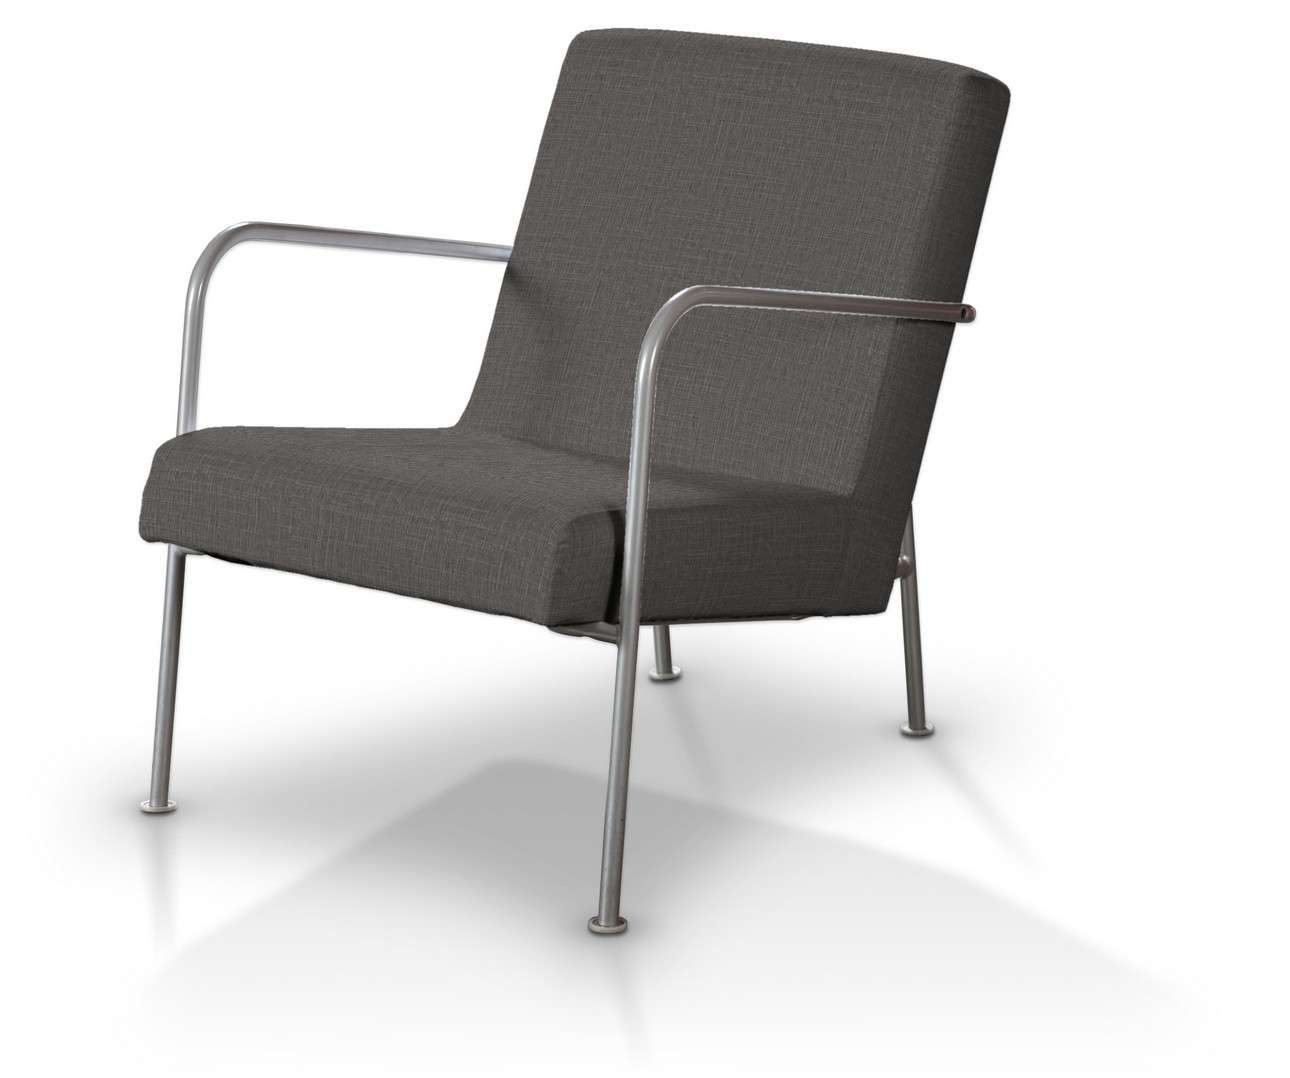 Pokrowiec na fotel Ikea PS w kolekcji Living II, tkanina: 161-16